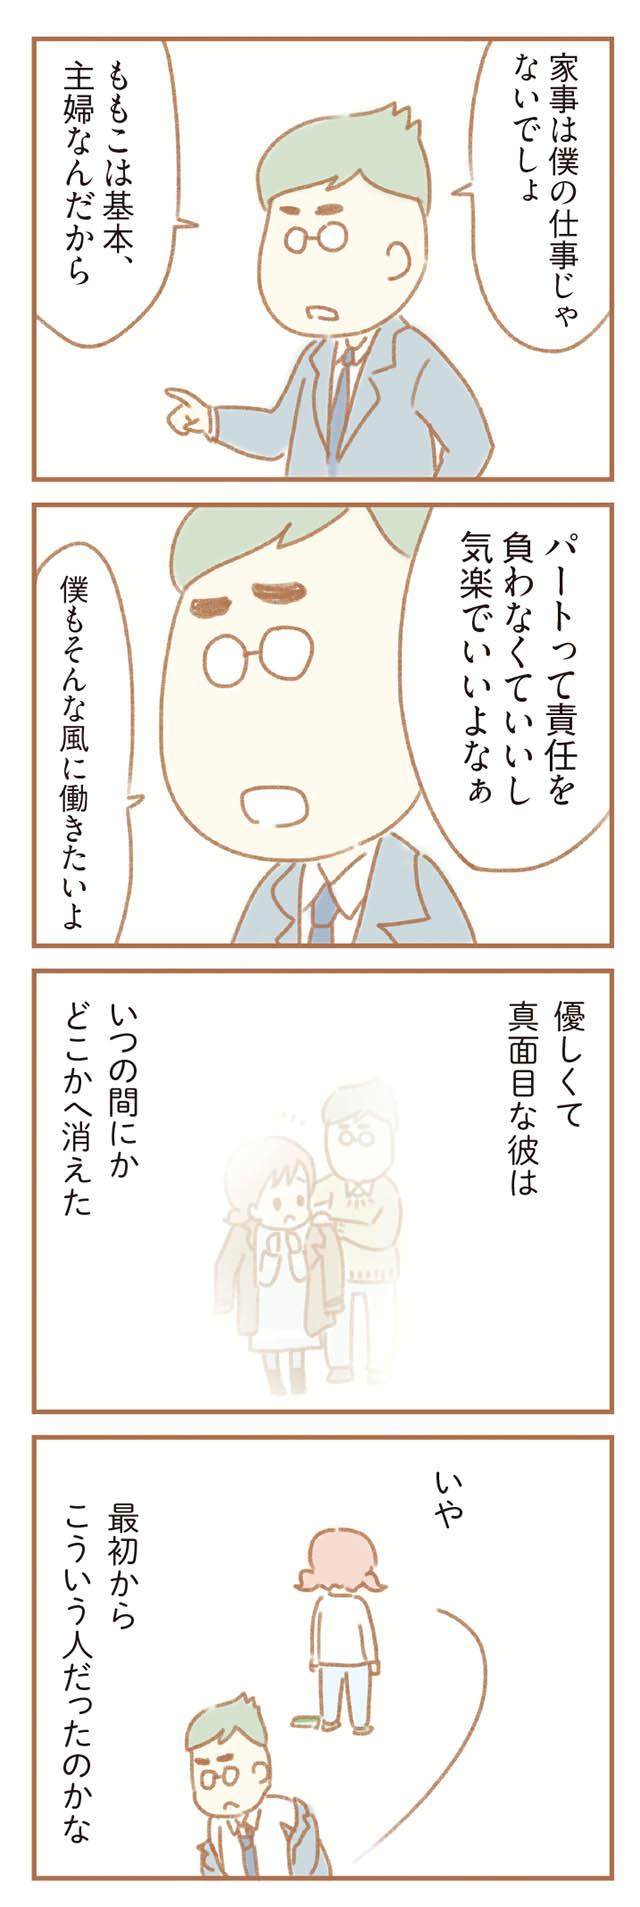 ottonohuyou_p12-2.jpg